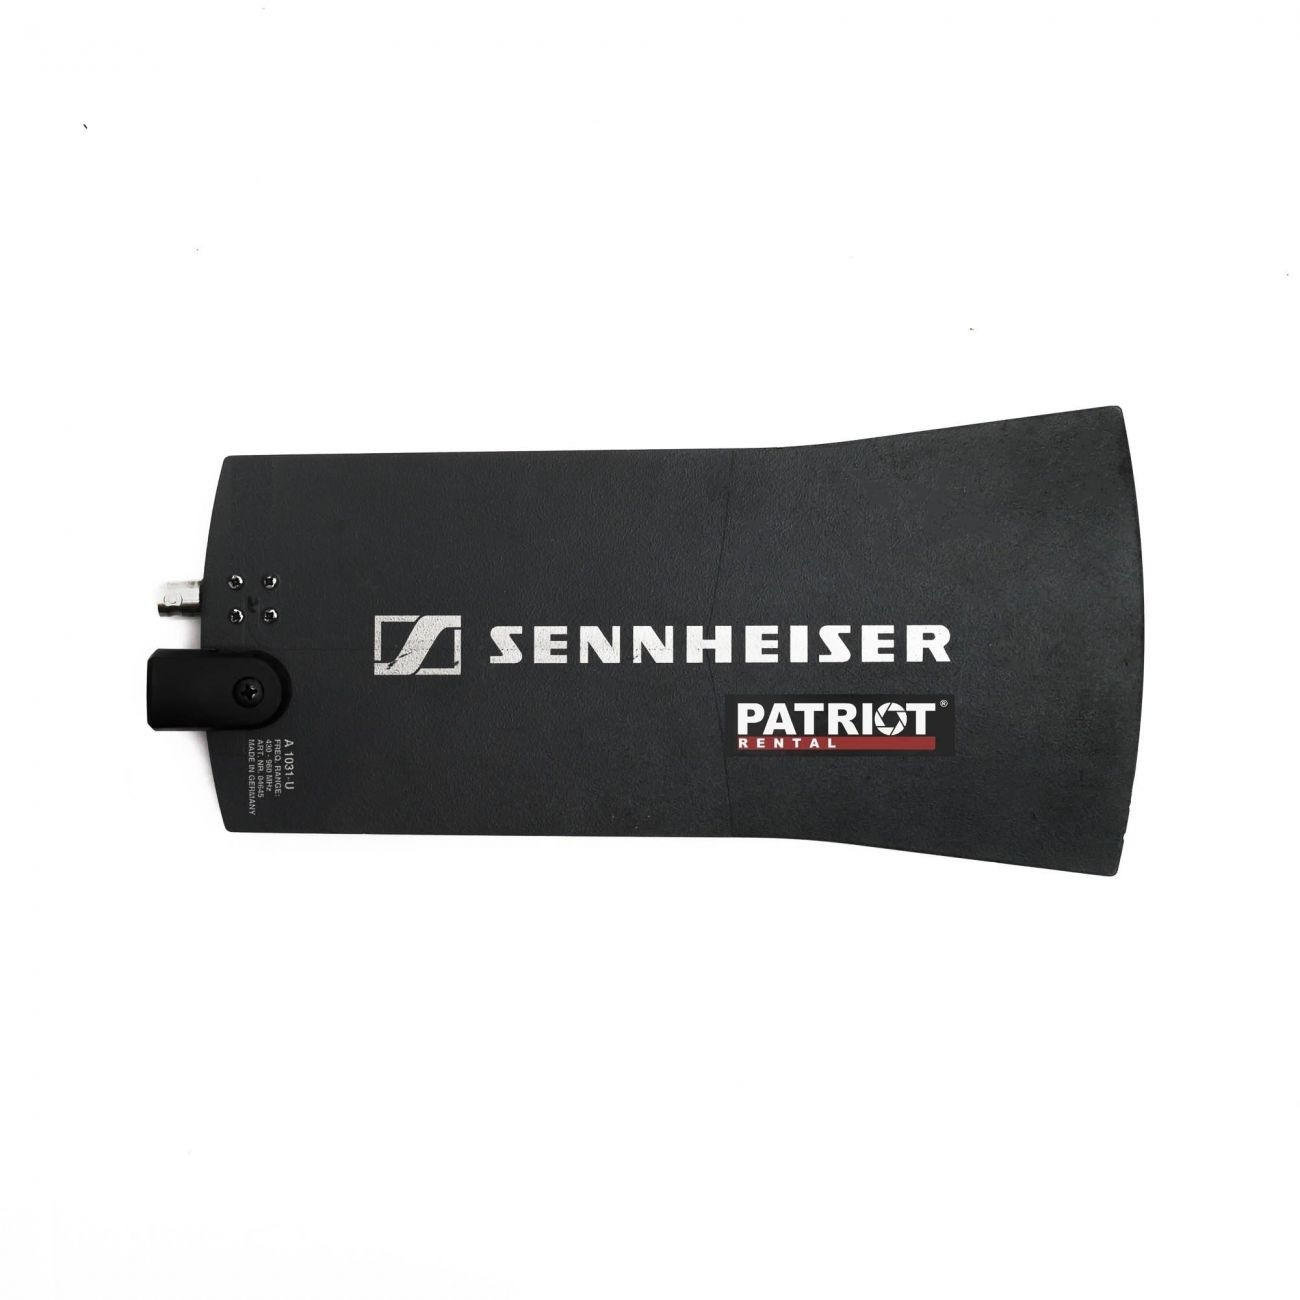 Sennheiser A 1031-U